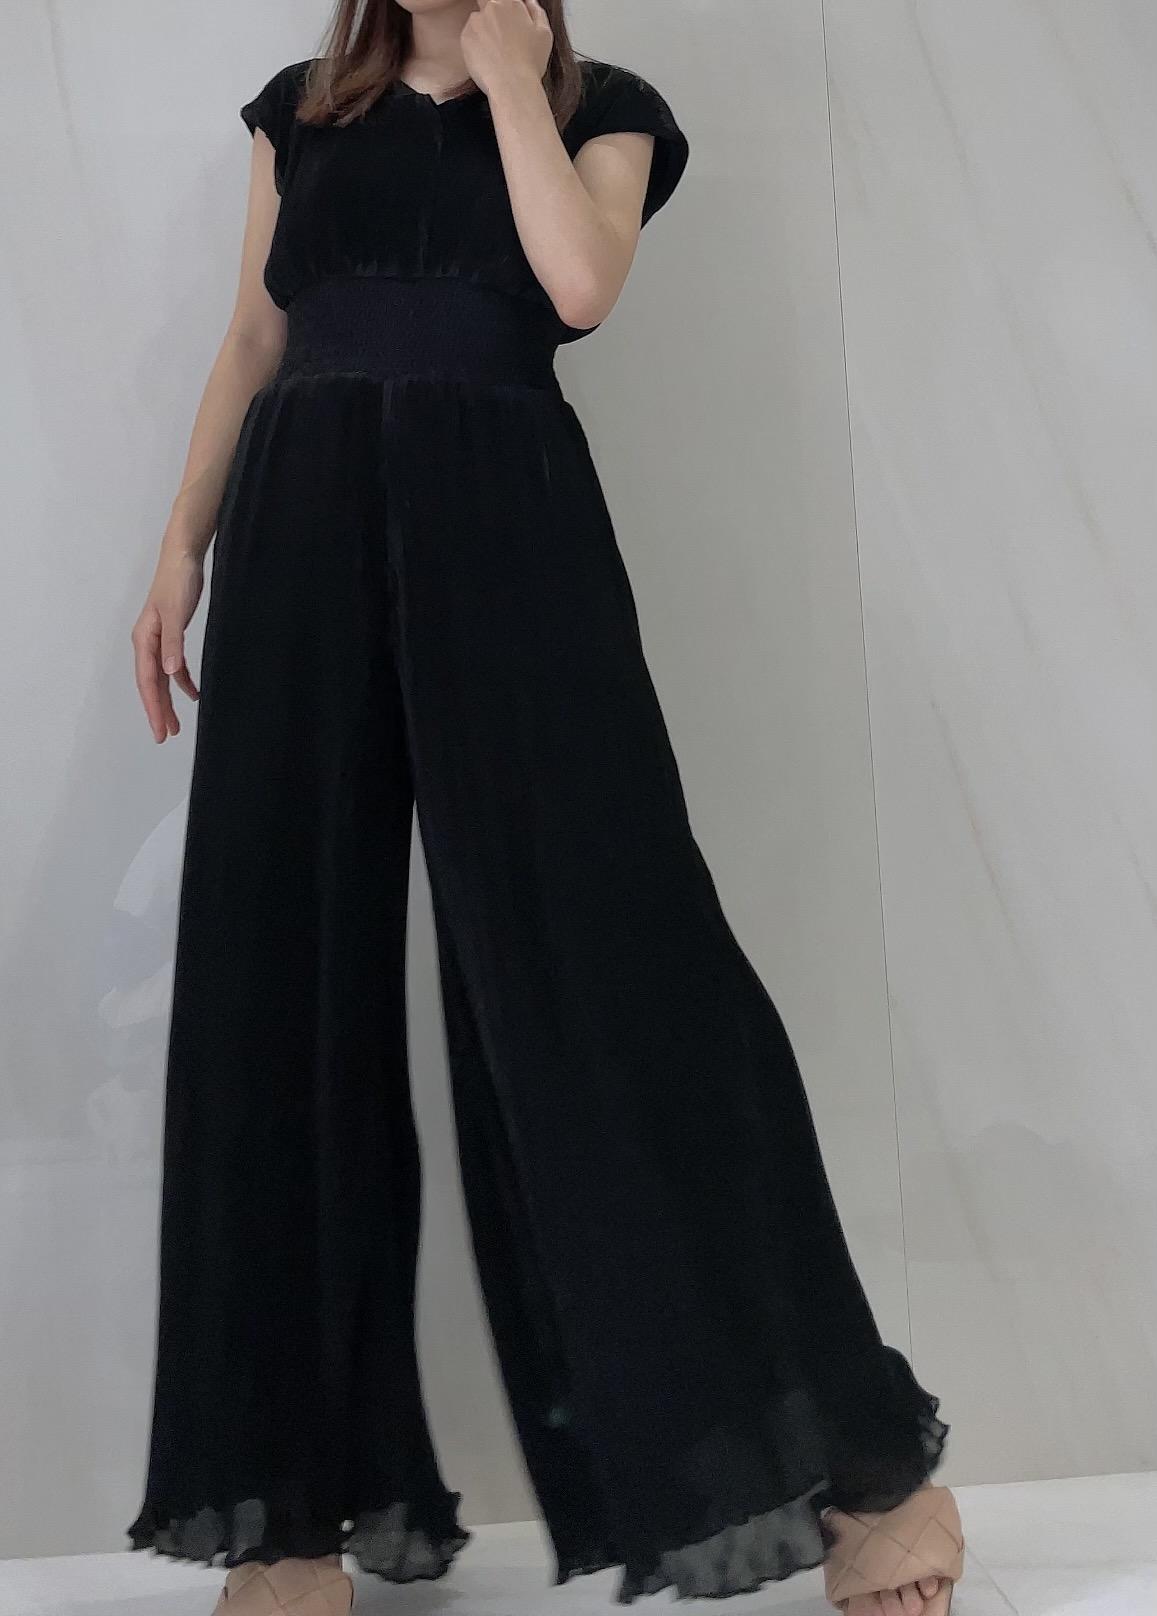 【selva secreta】Pleats ALL IN ONE(black)